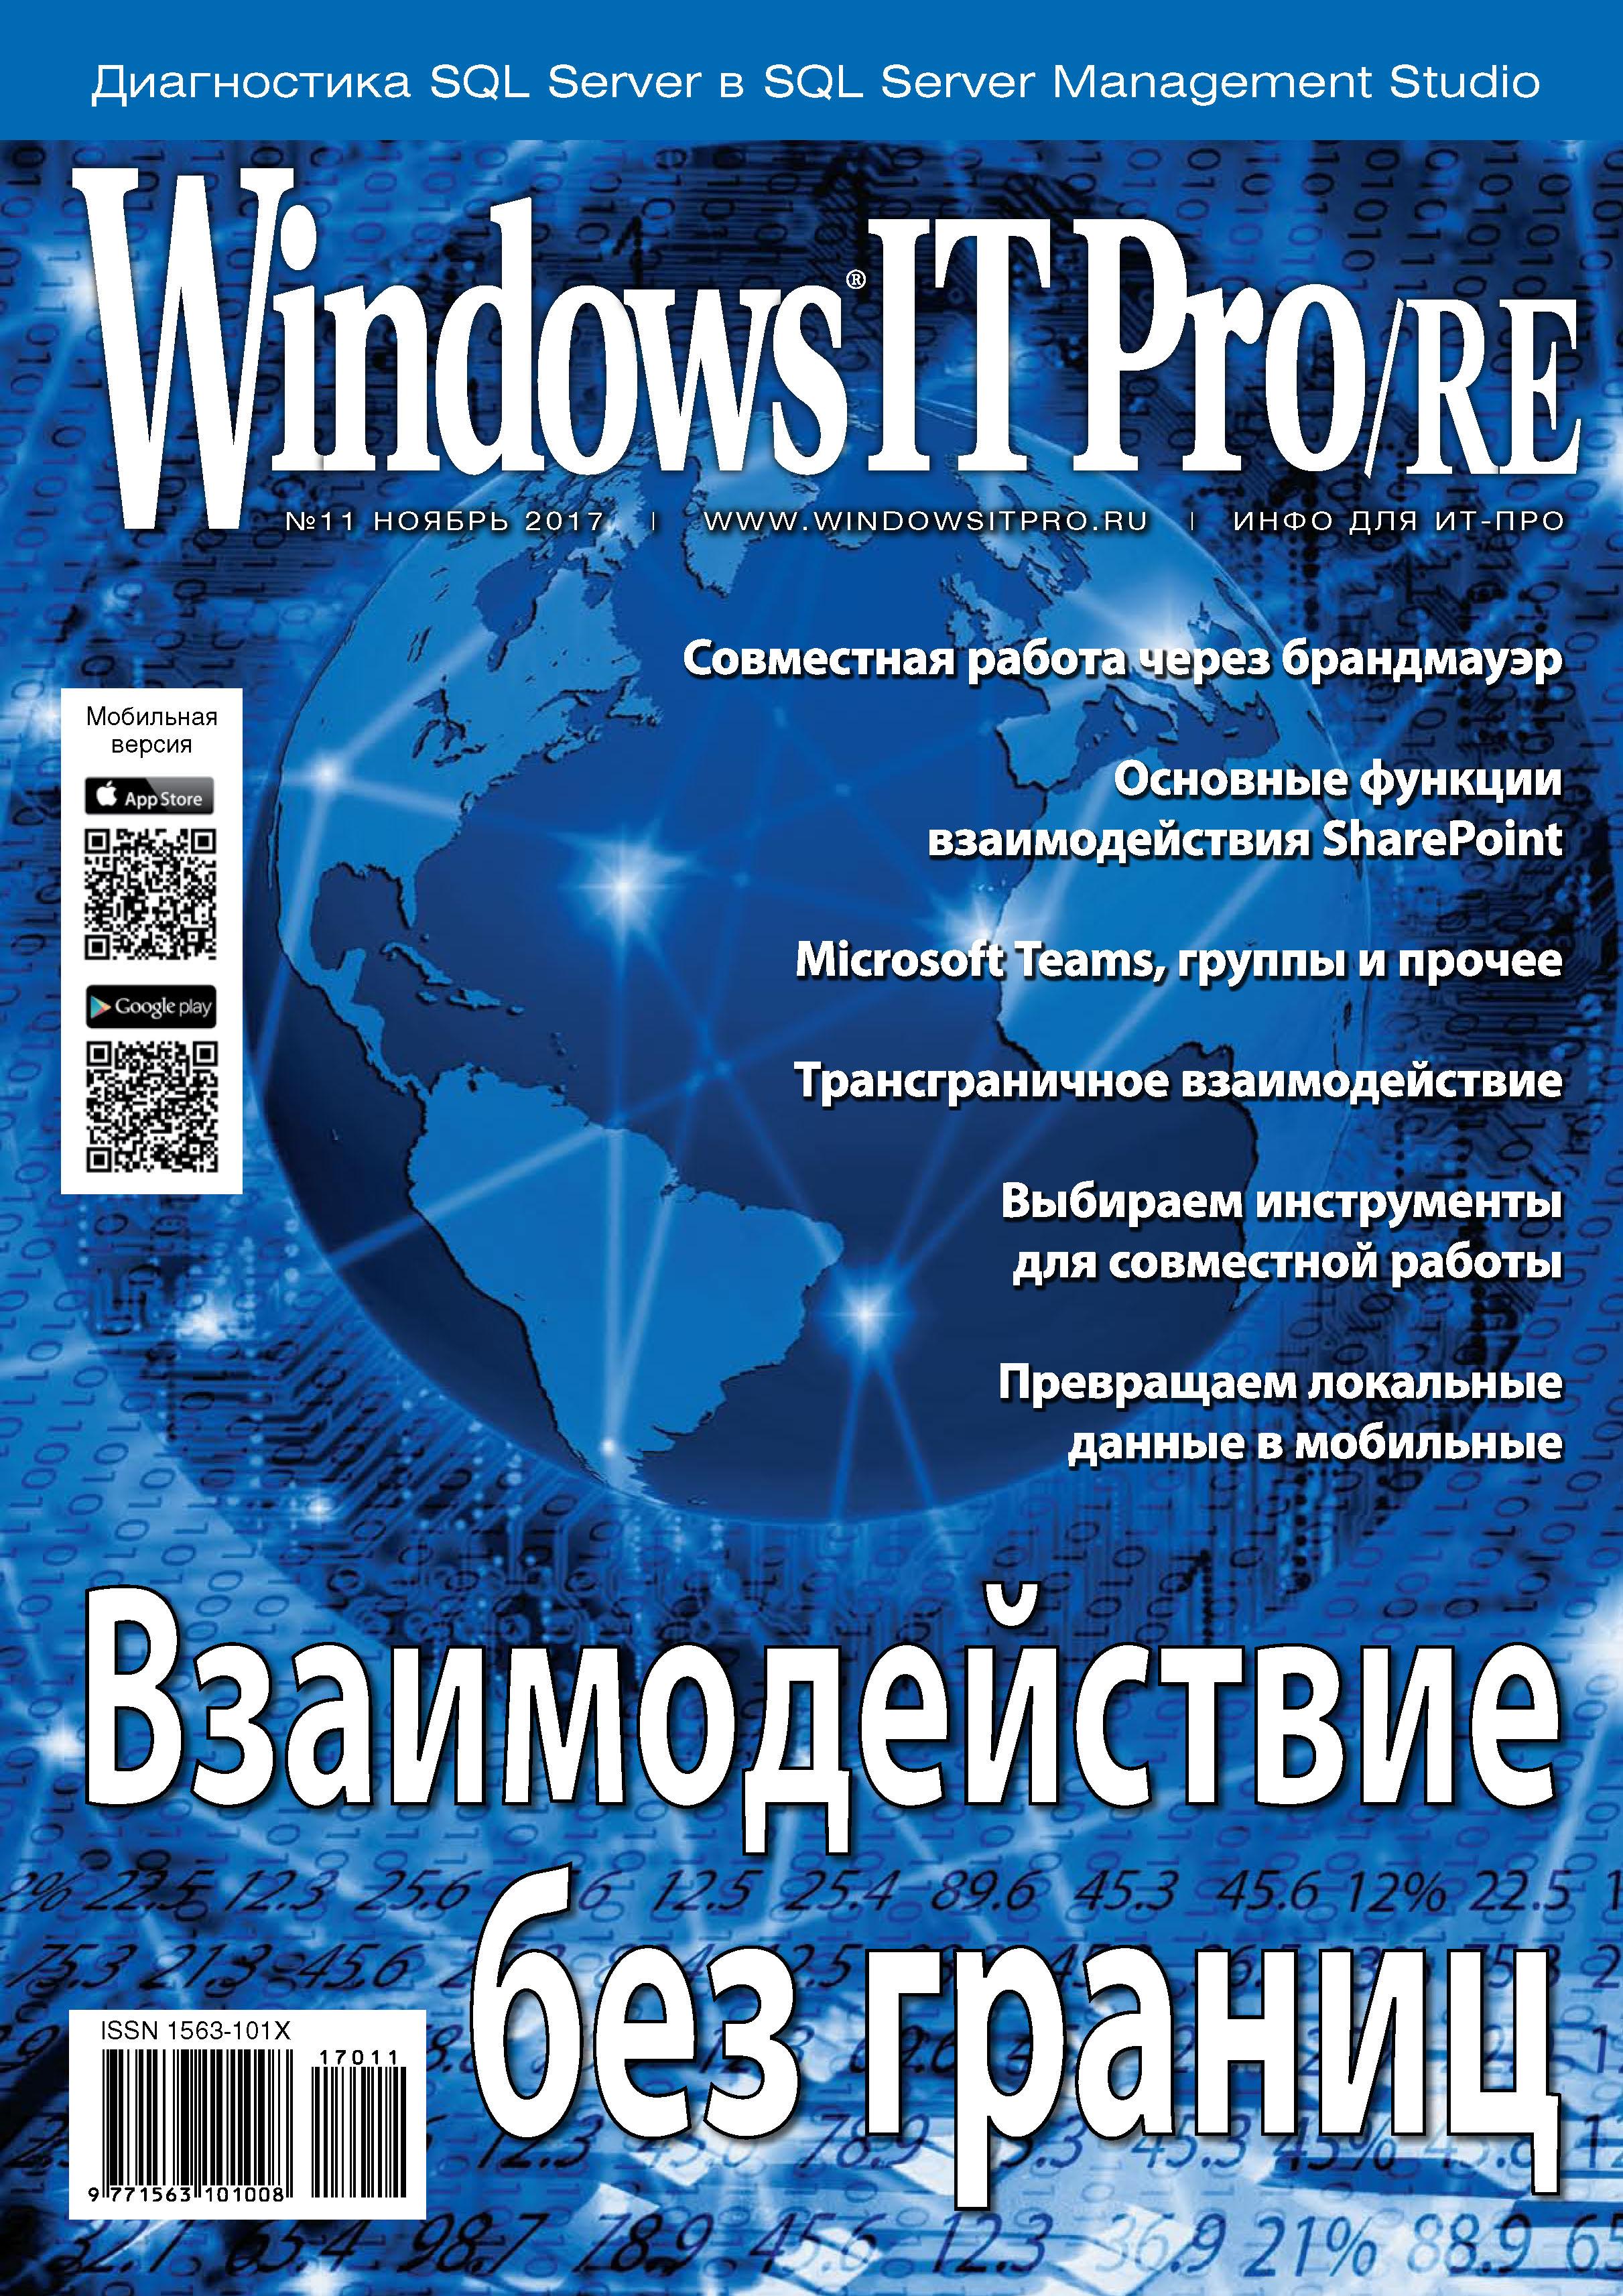 Открытые системы Windows IT Pro/RE №11/2017